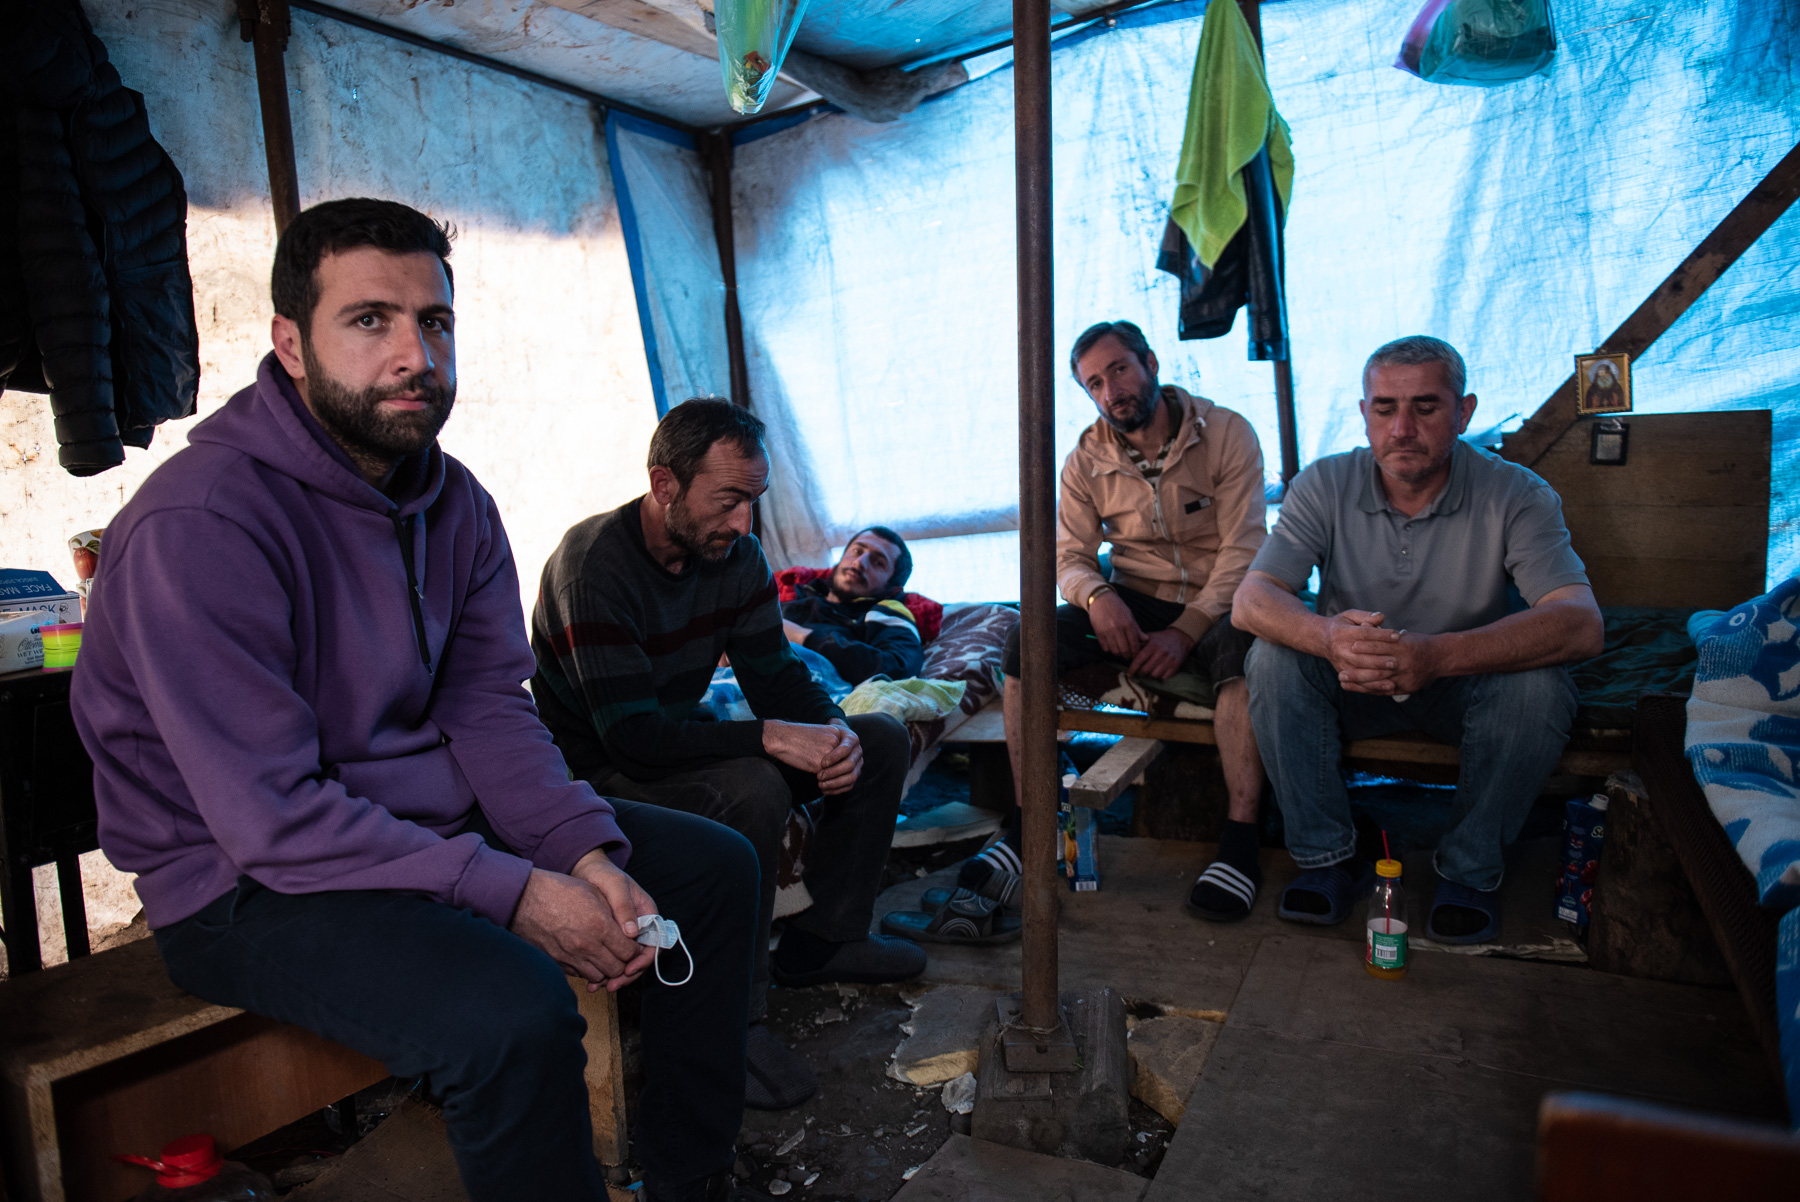 Five men sewed their lips together two weeks ago. Photo:MariamNikuradze/OCMedia.